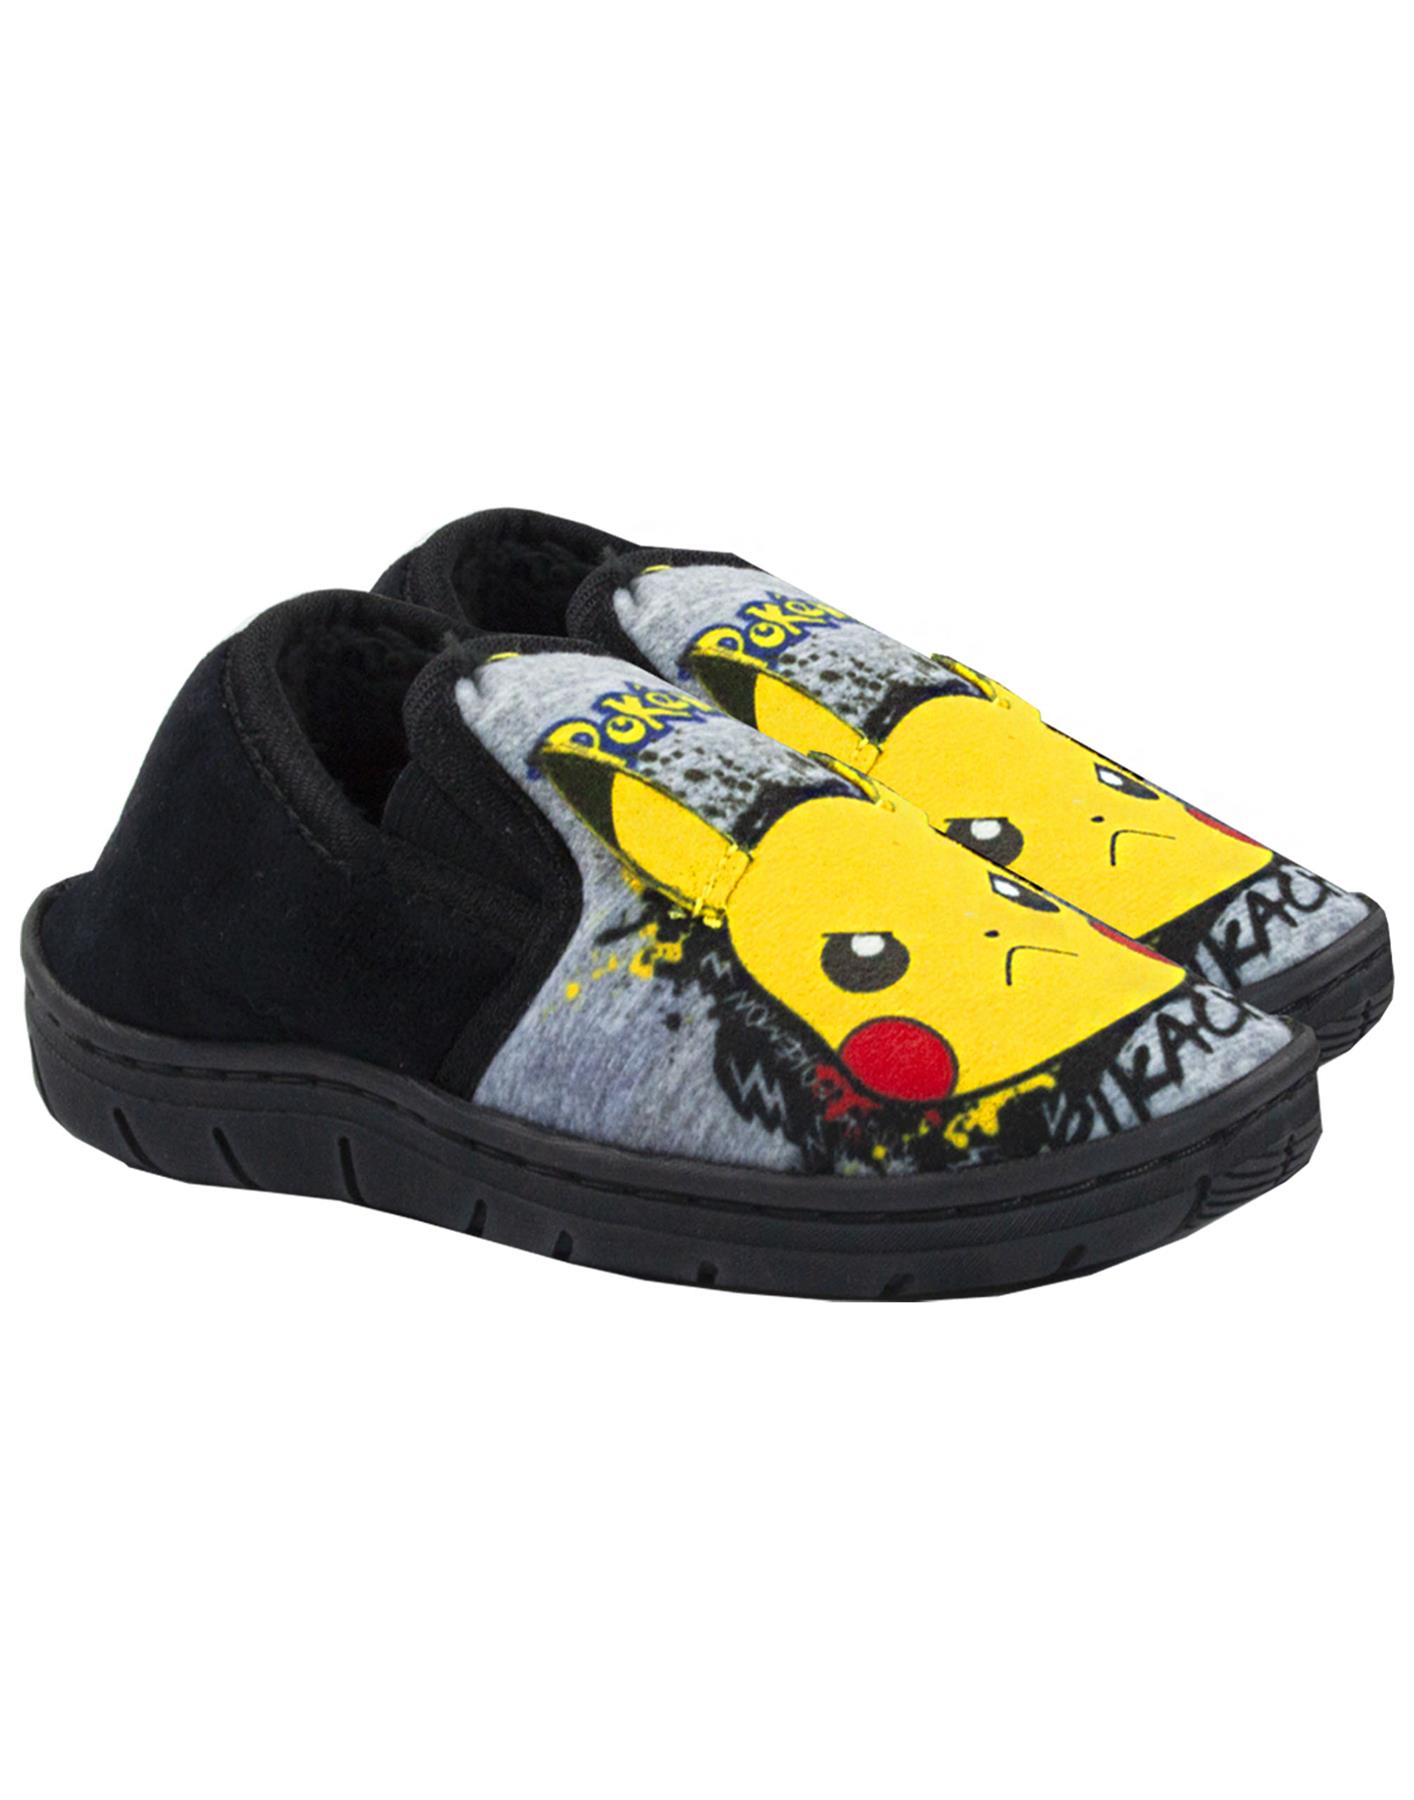 Pantoufles Mocassins Marl Marl Gris Enfant Pokemon Pikachu ...